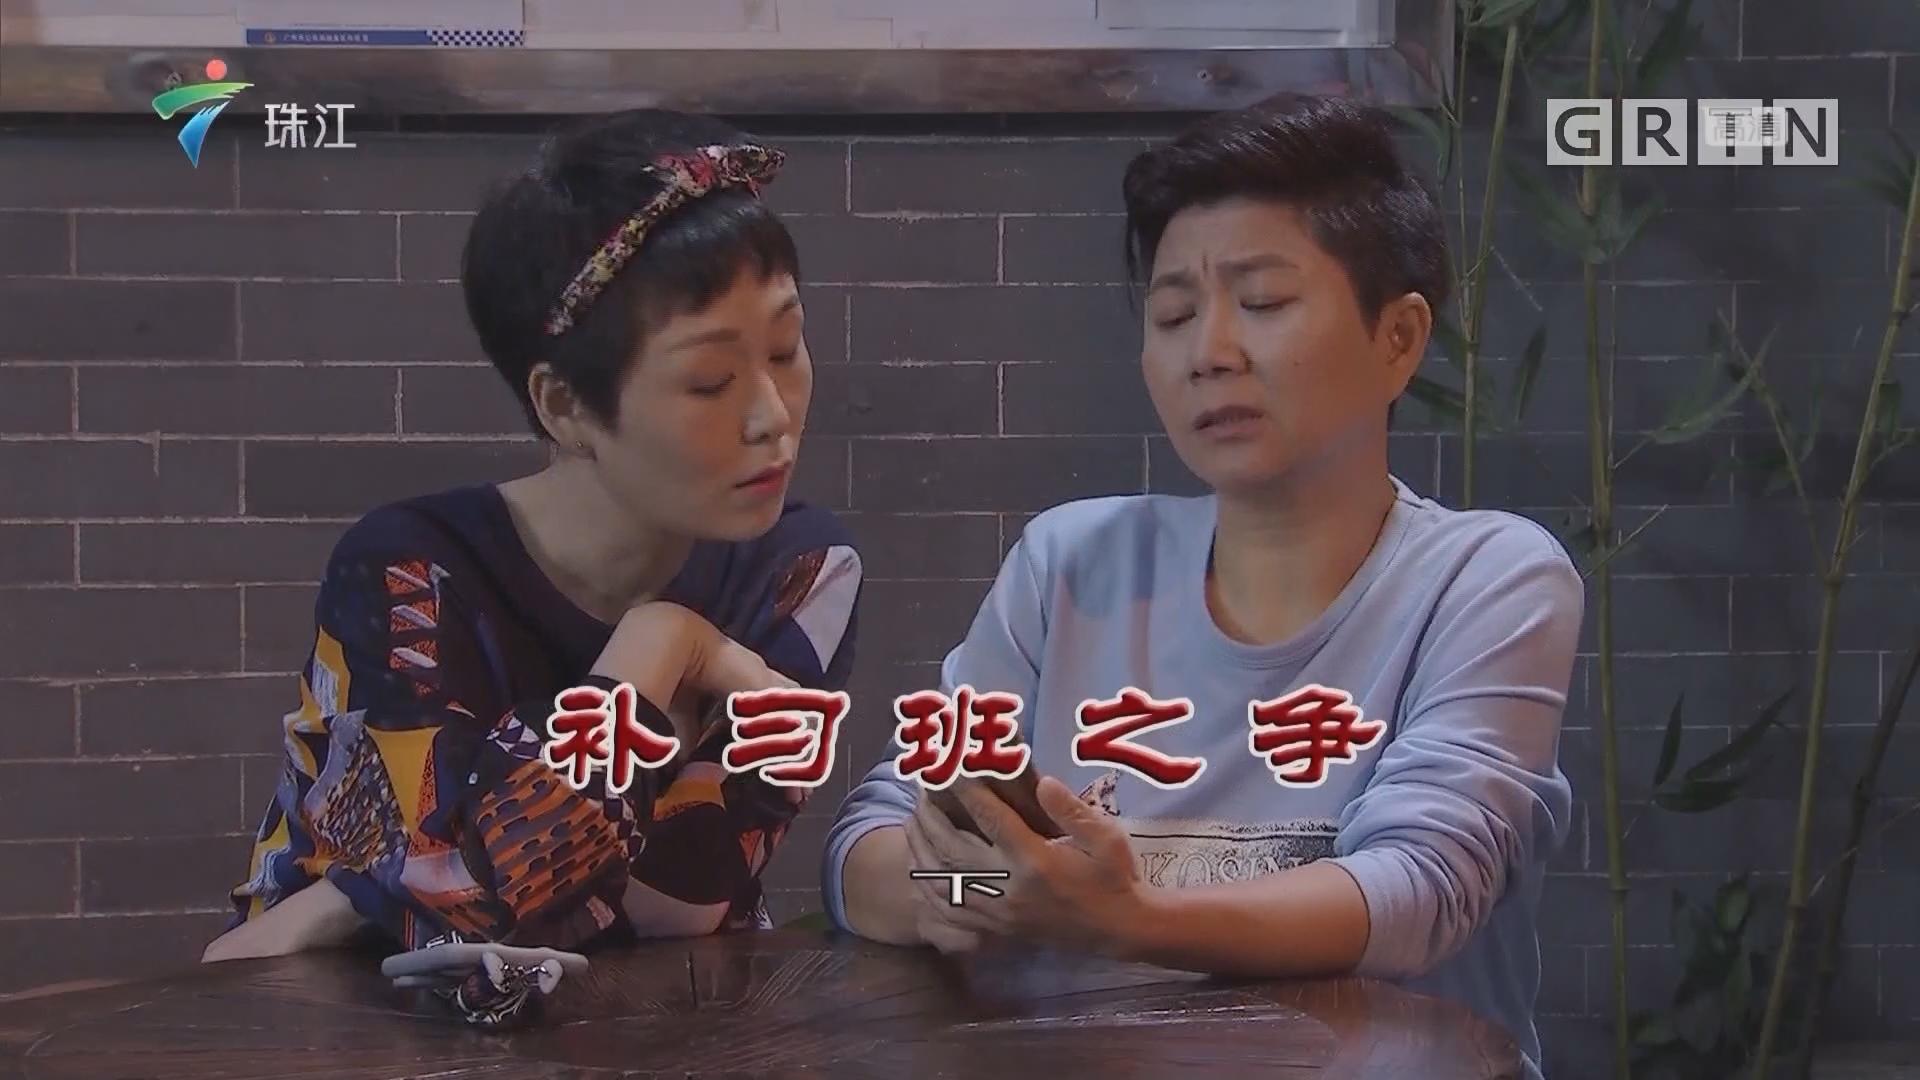 [HD][2019-11-23]外来媳妇本地郎:补习班之争(下)